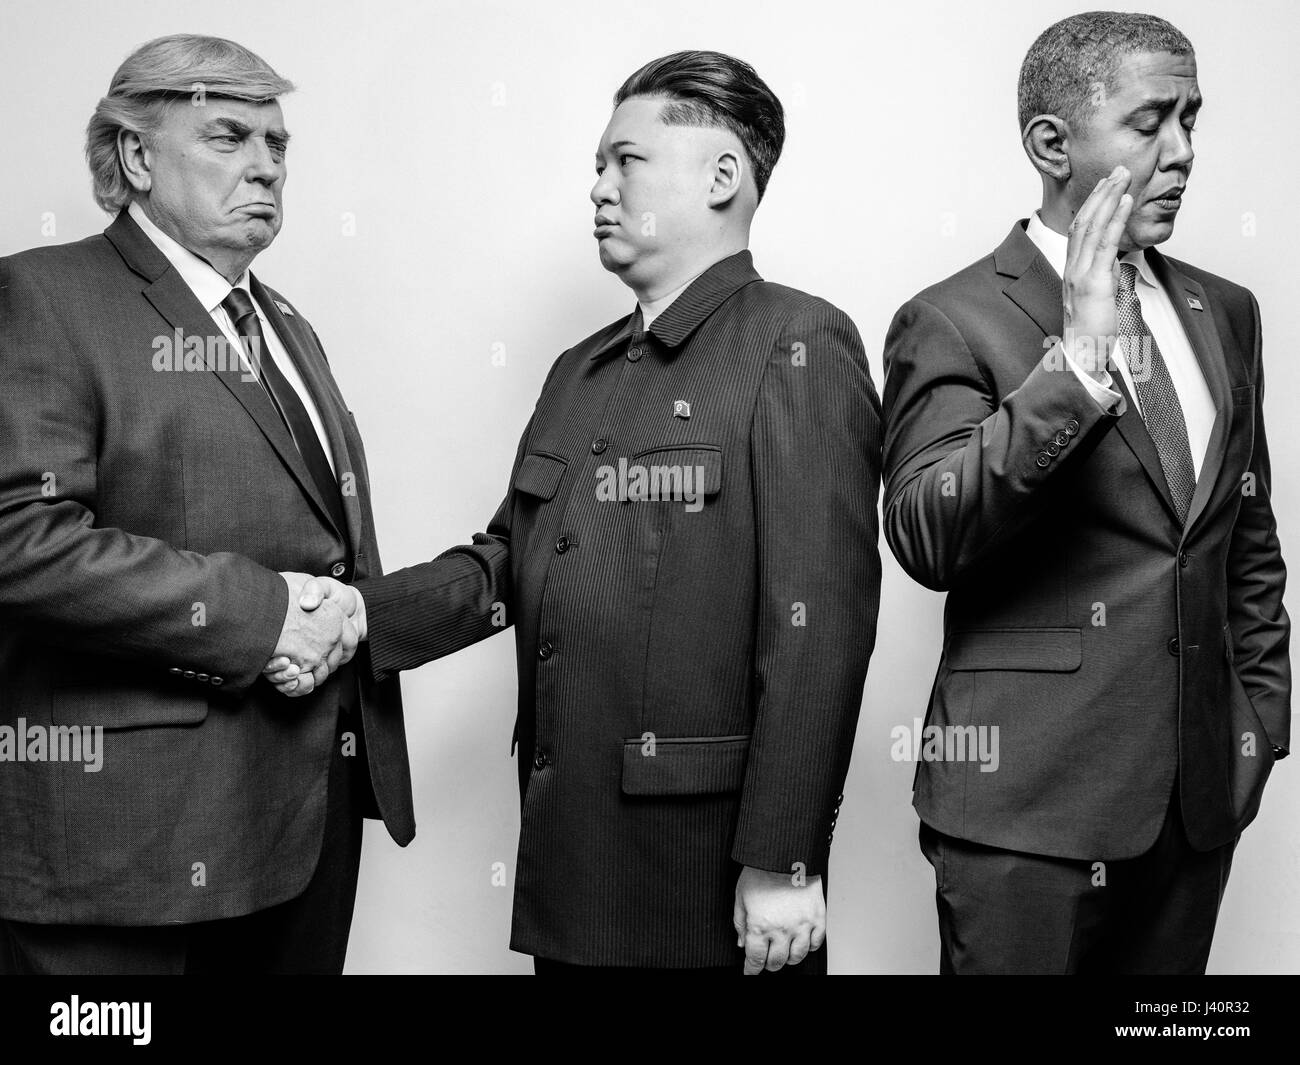 President Donald J Trump, President Barack Obama and Supreme Leader of North Korea Kim Jong-Un lookalikes meet for - Stock Image